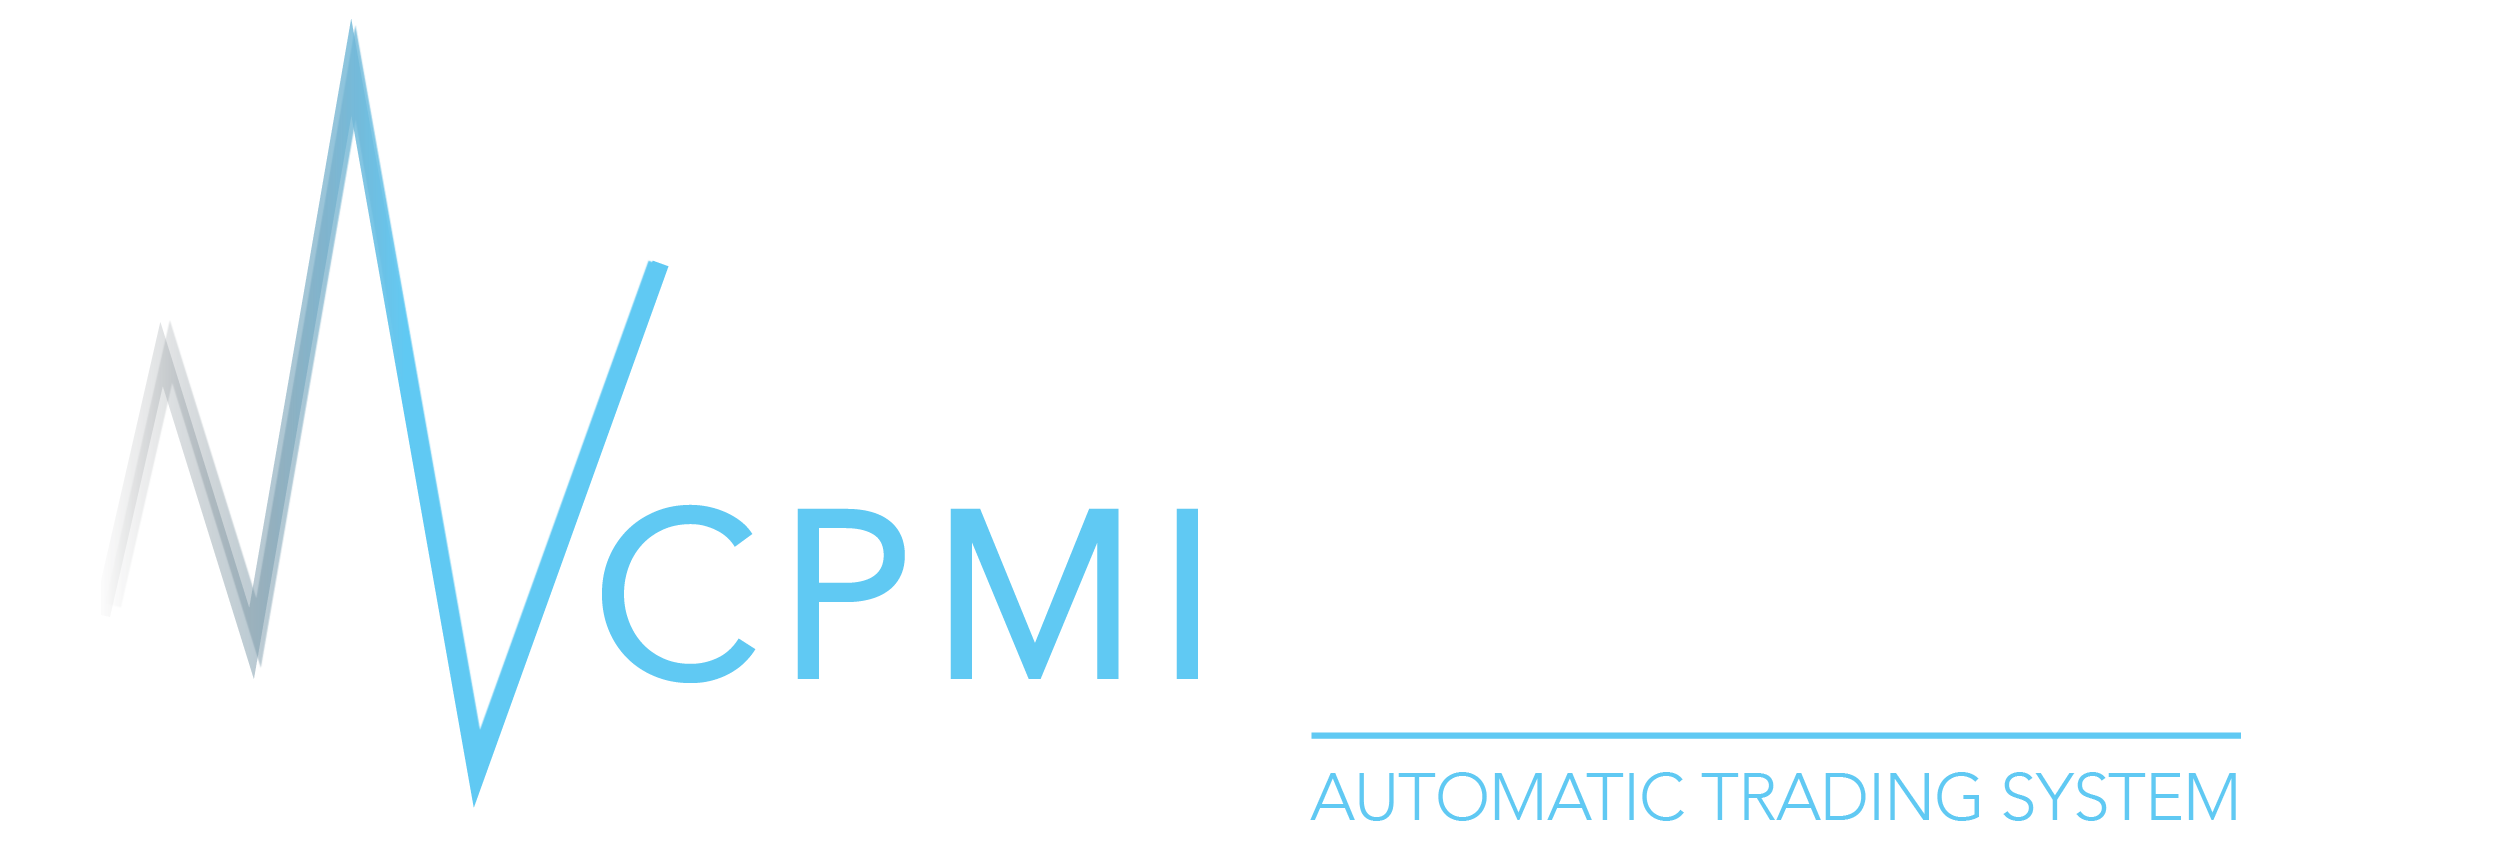 VC Price Momentum Indicator